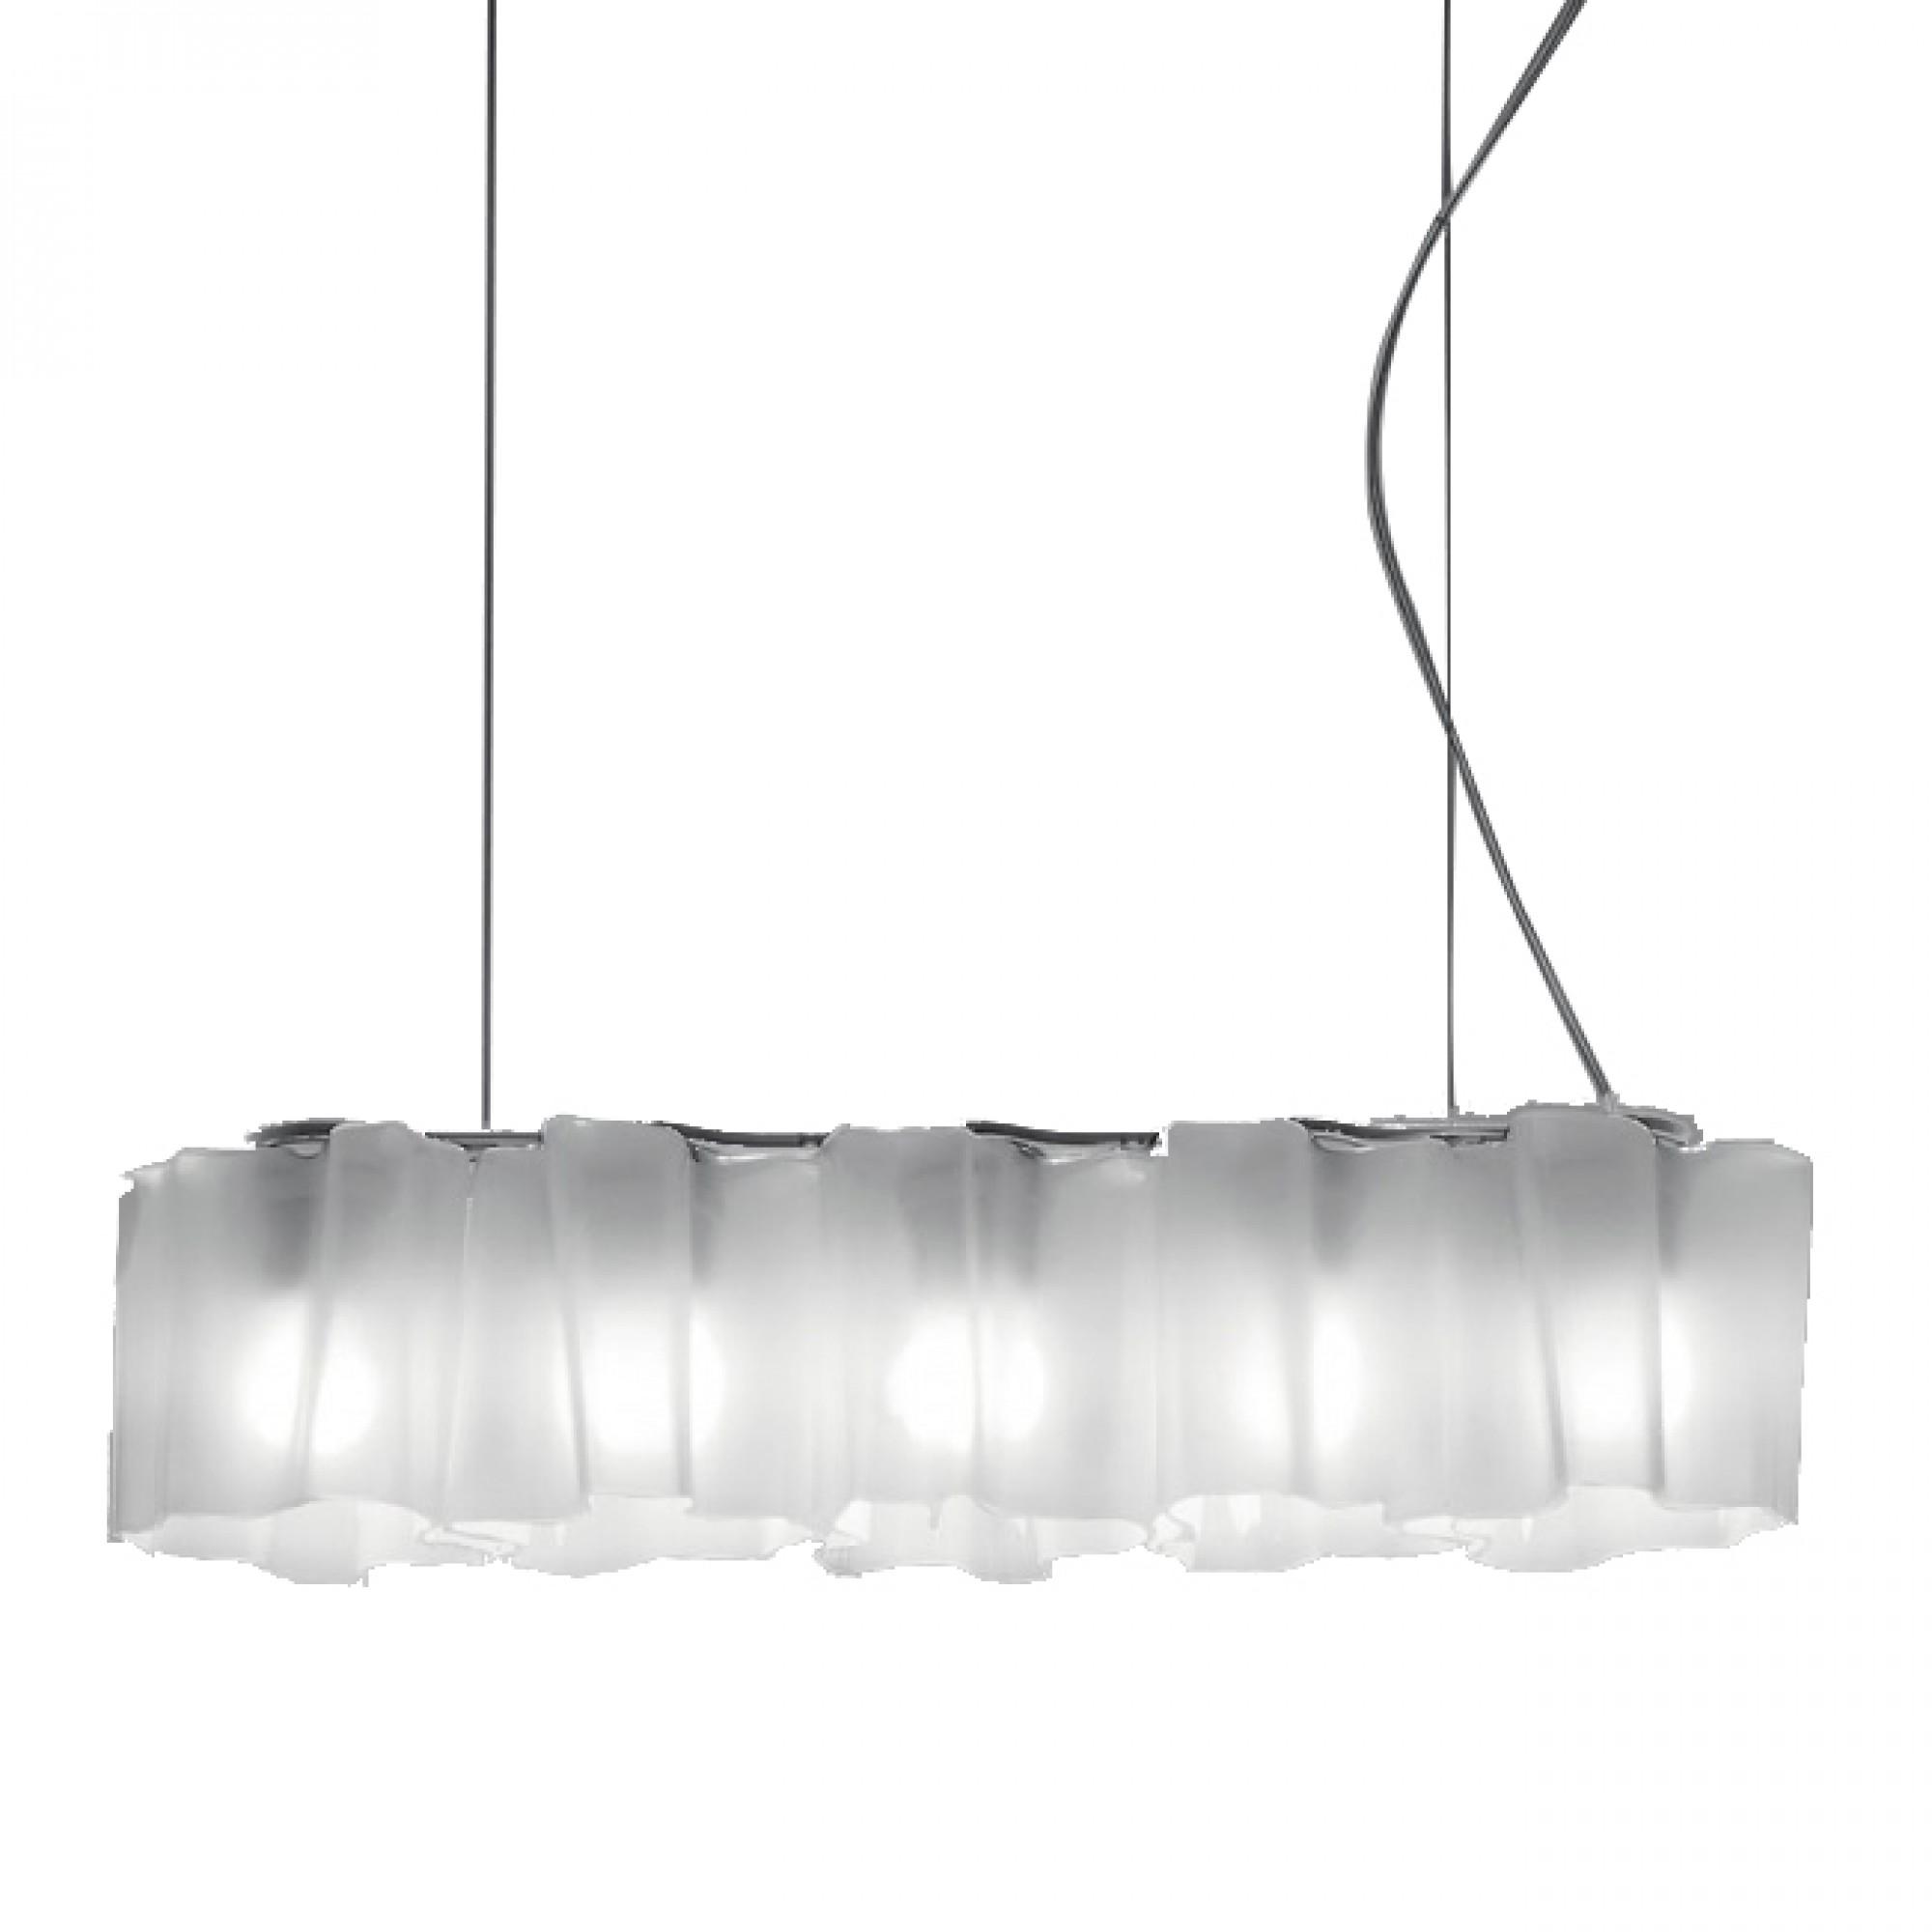 LOGICO SOSP. MICRO 5 IN LINEA SUSPENSION LAMP -  -  ARTEMIDE